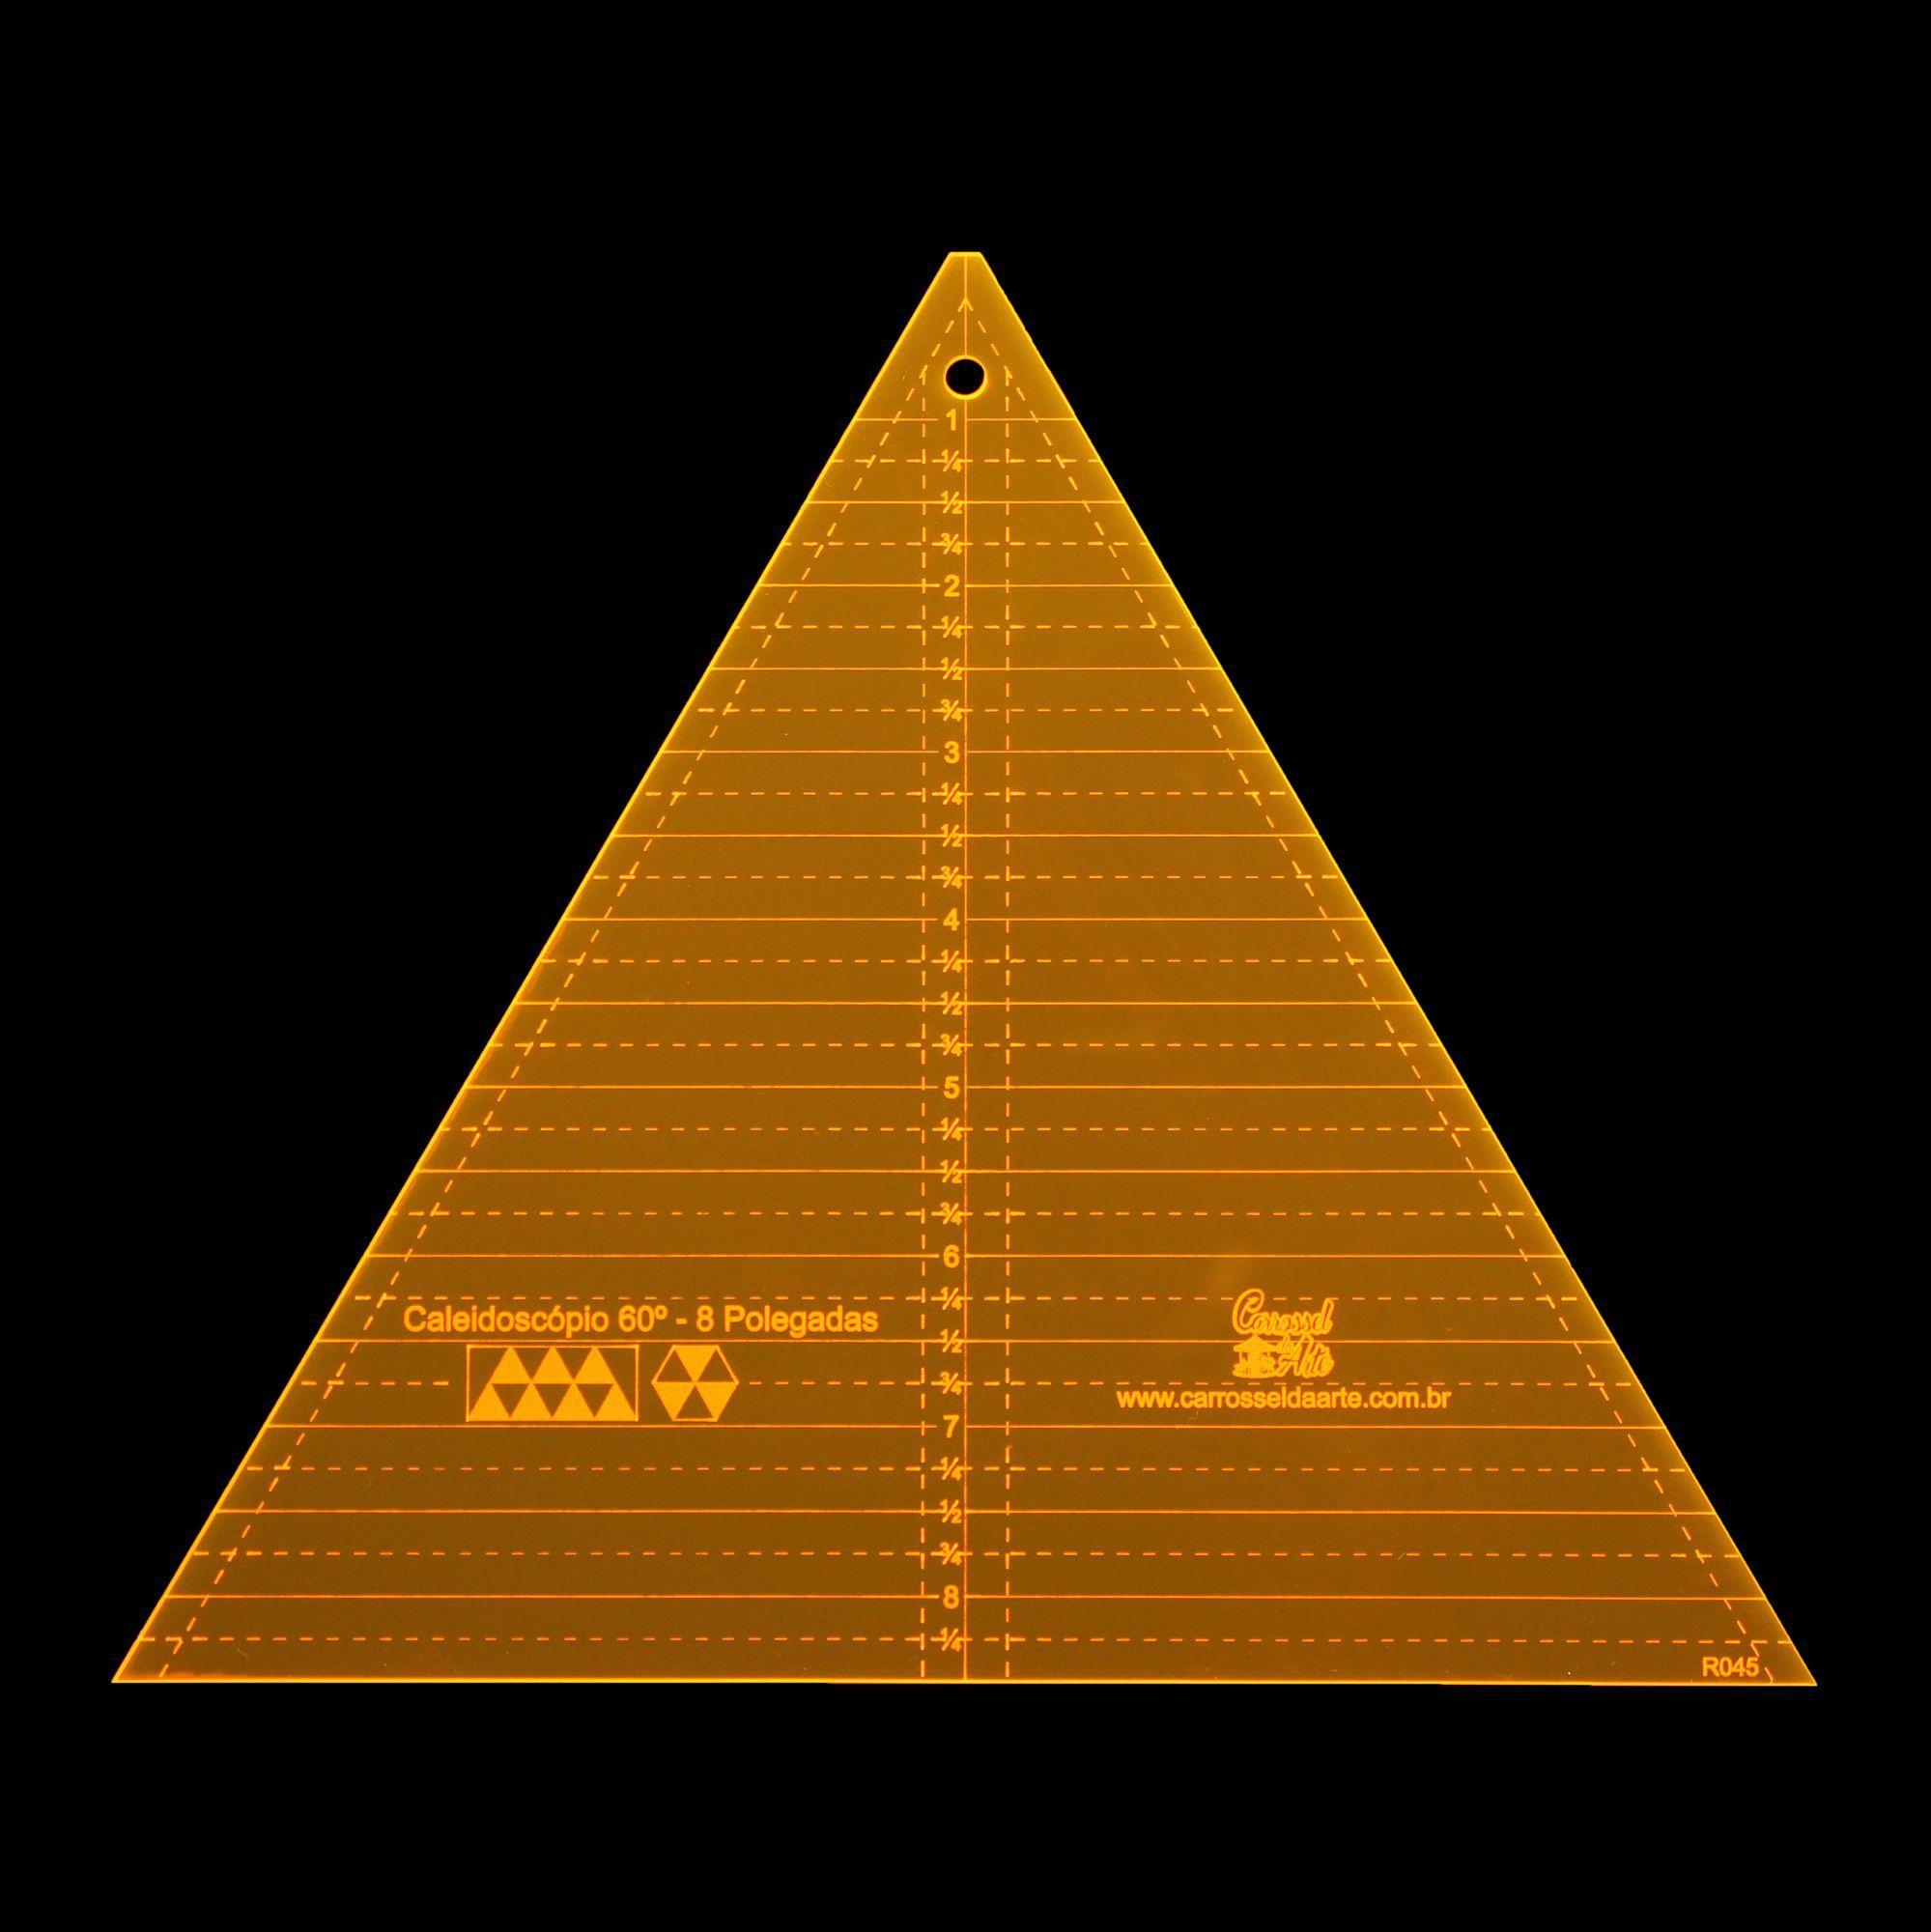 Régua para Patchwork Caleidoscópio 60° - 8 Pétalas - Polegadas